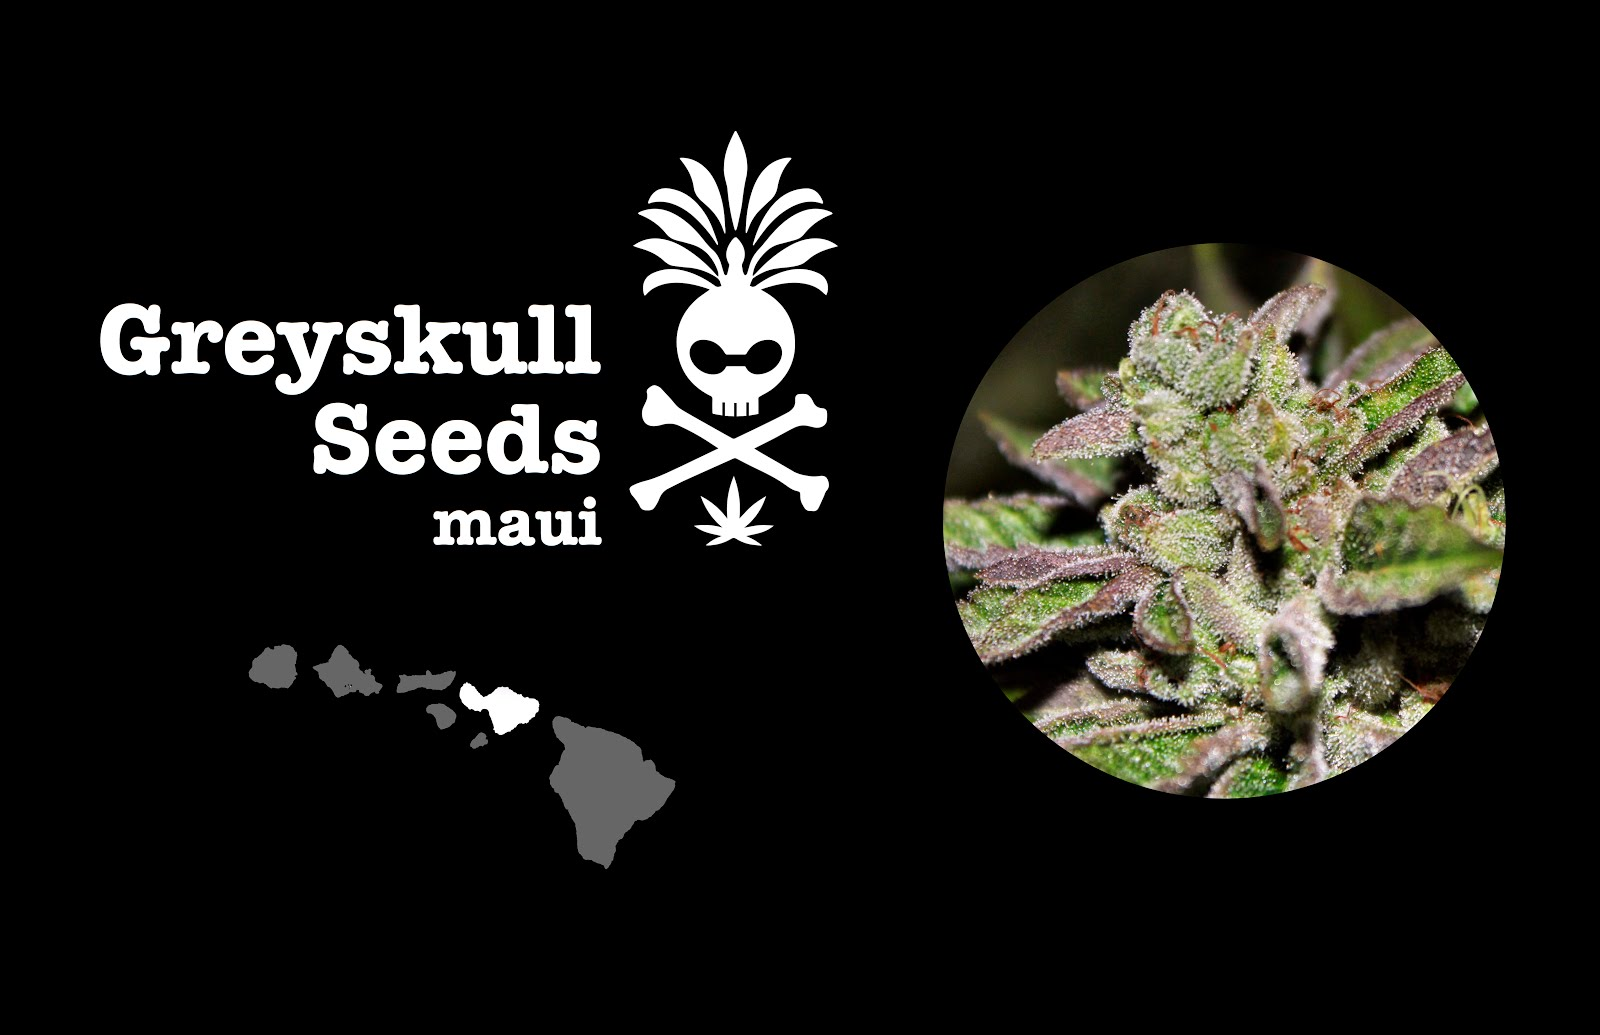 Greyskull Seeds